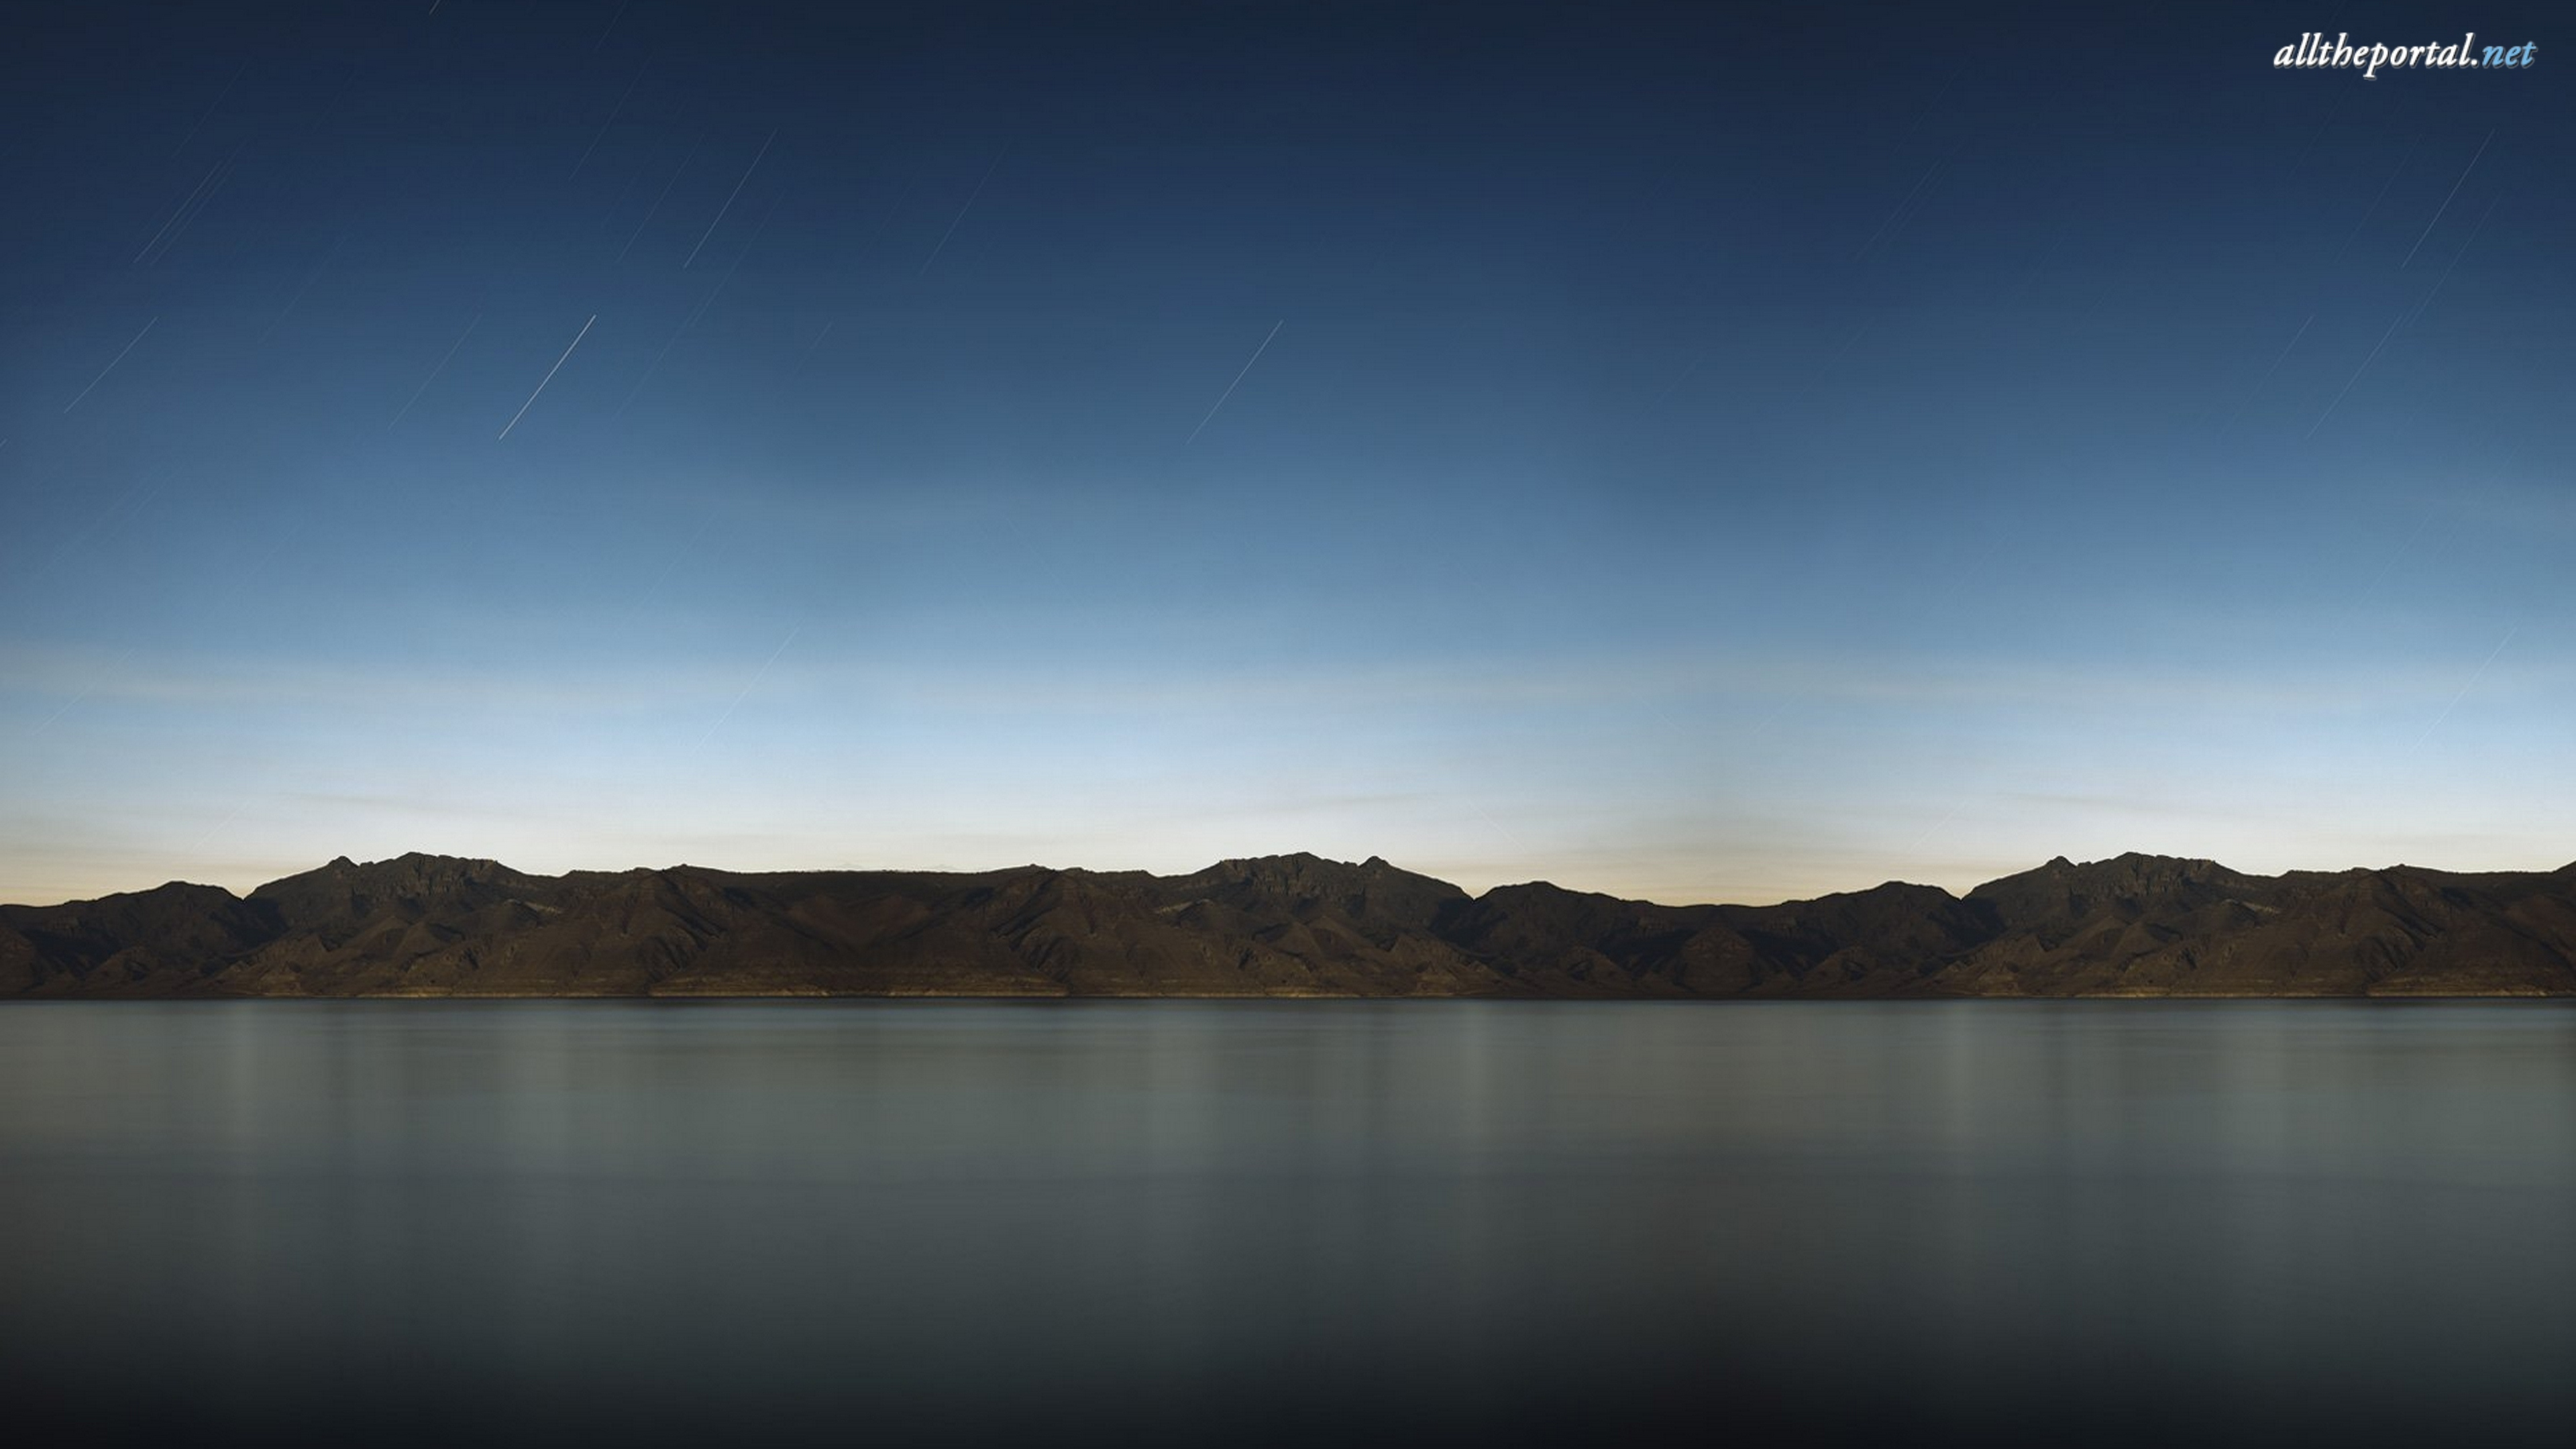 ALLTHEPORTAL.NET_Impressive Ultra HD Landscape Wallpaper (41).jpg